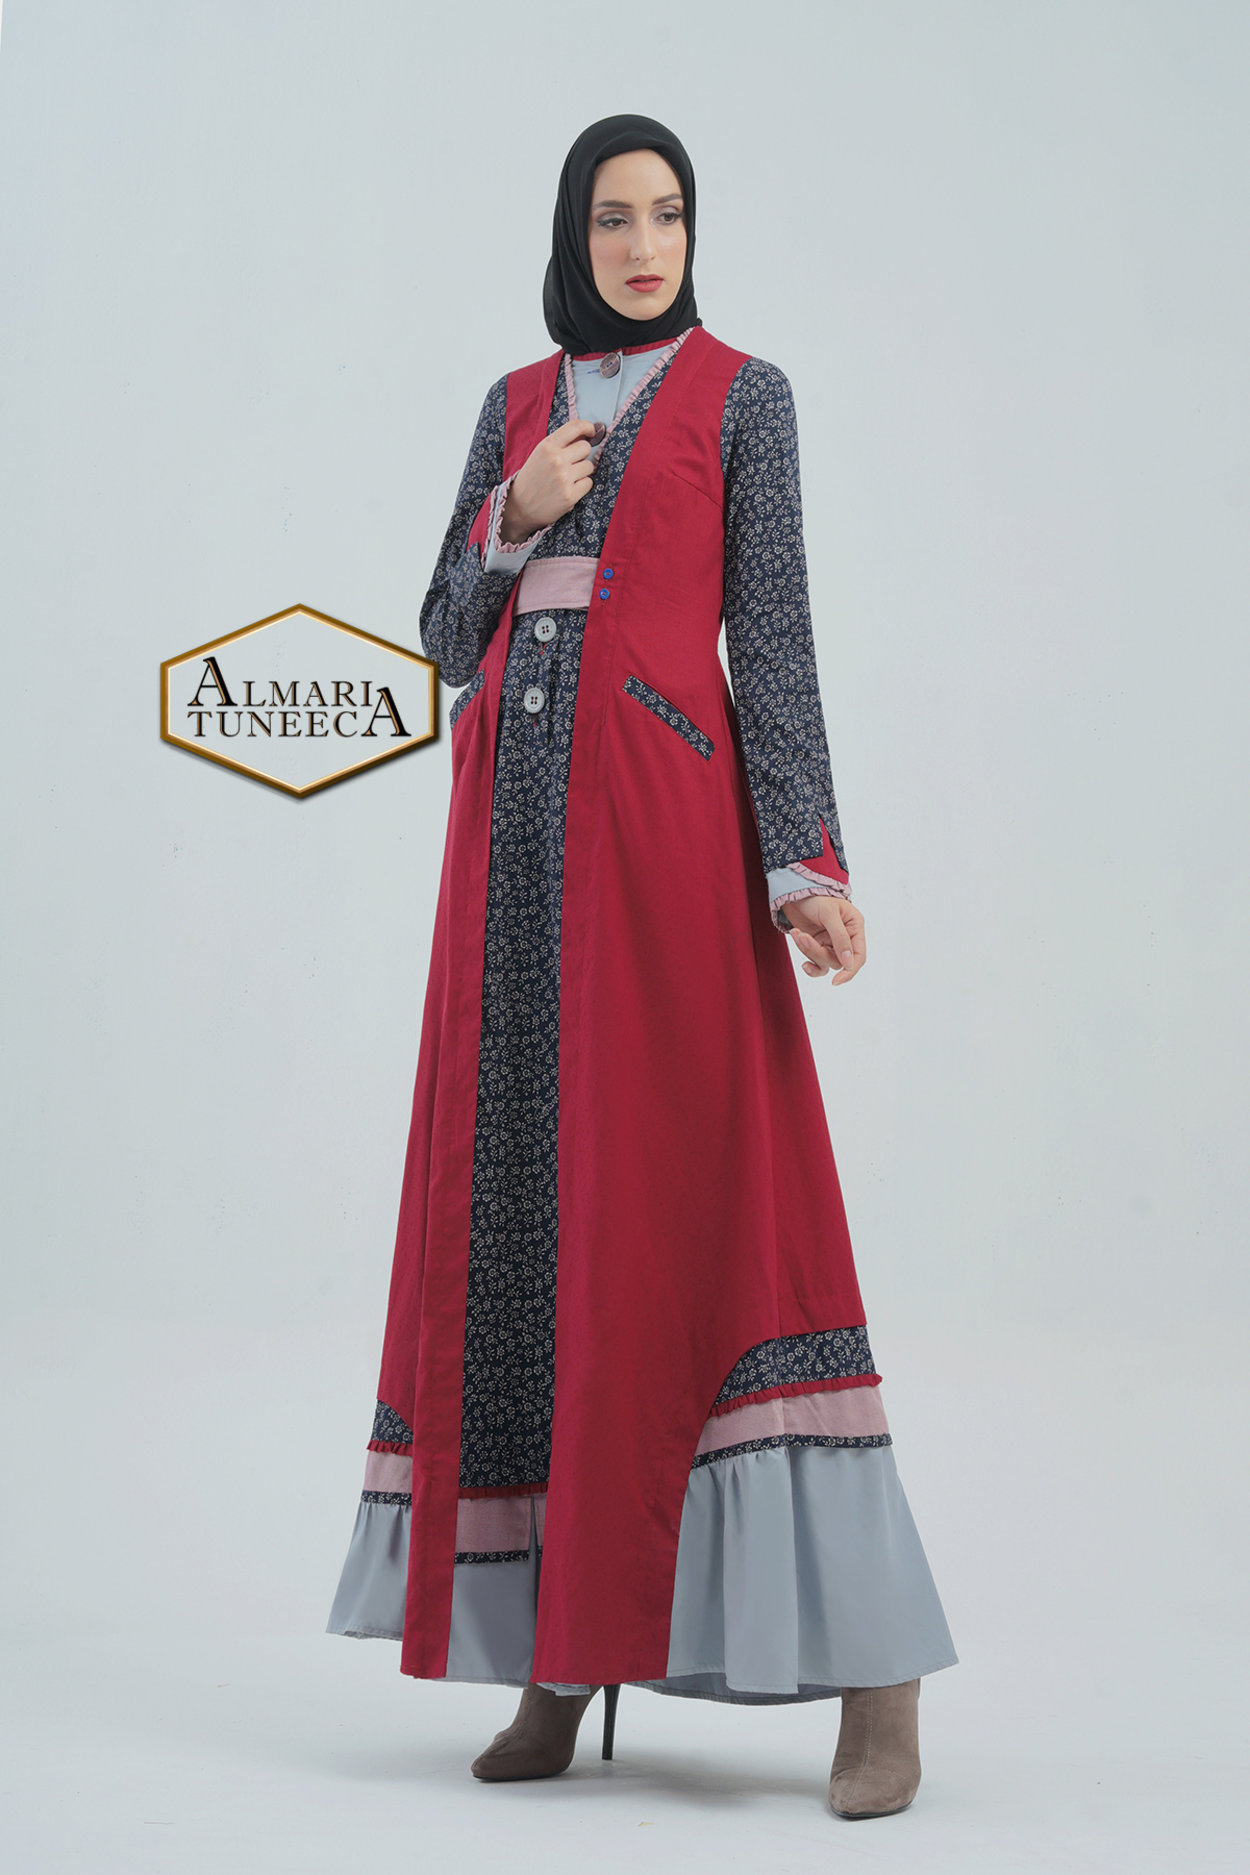 Gamis Tuneeca Model Baju Tuneeca Terbaru 2020 Hijabfest